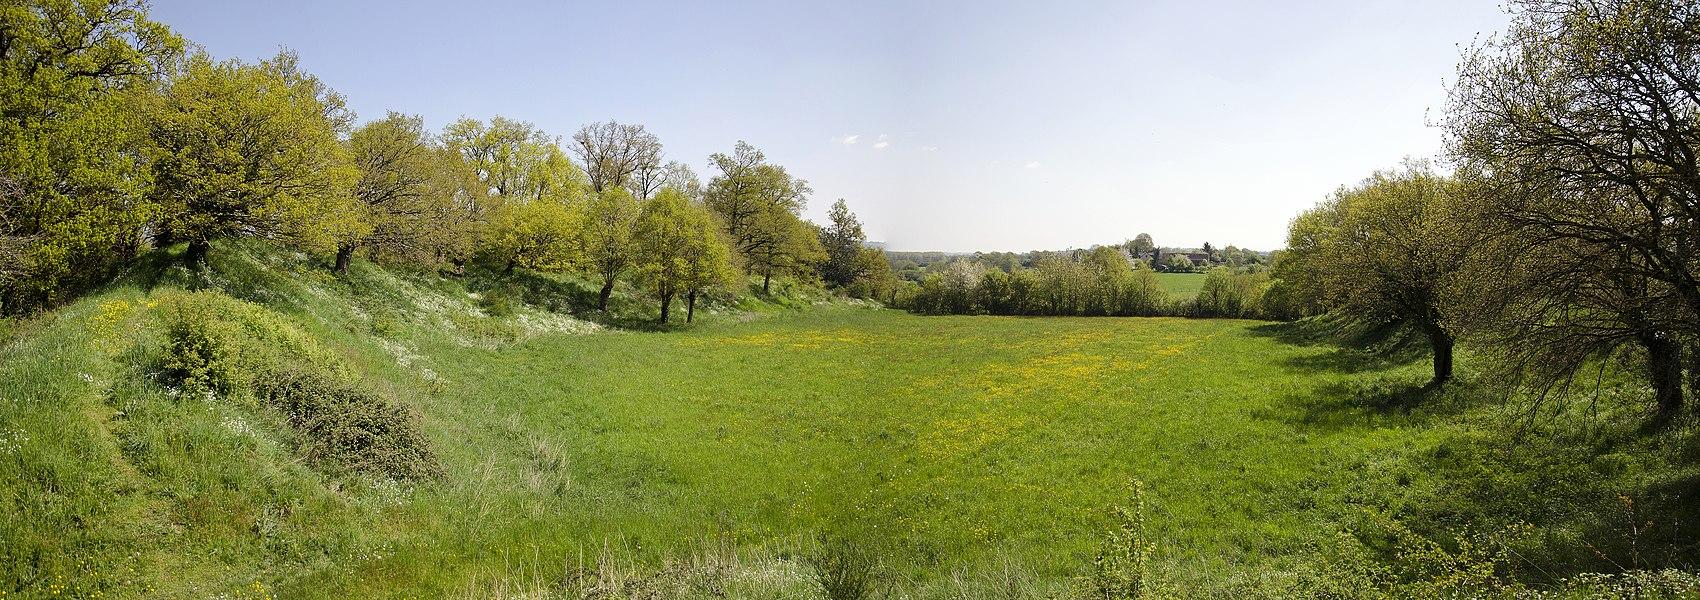 Camp de Beugy, Sainte-Suzanne, Mayenne, 2013.